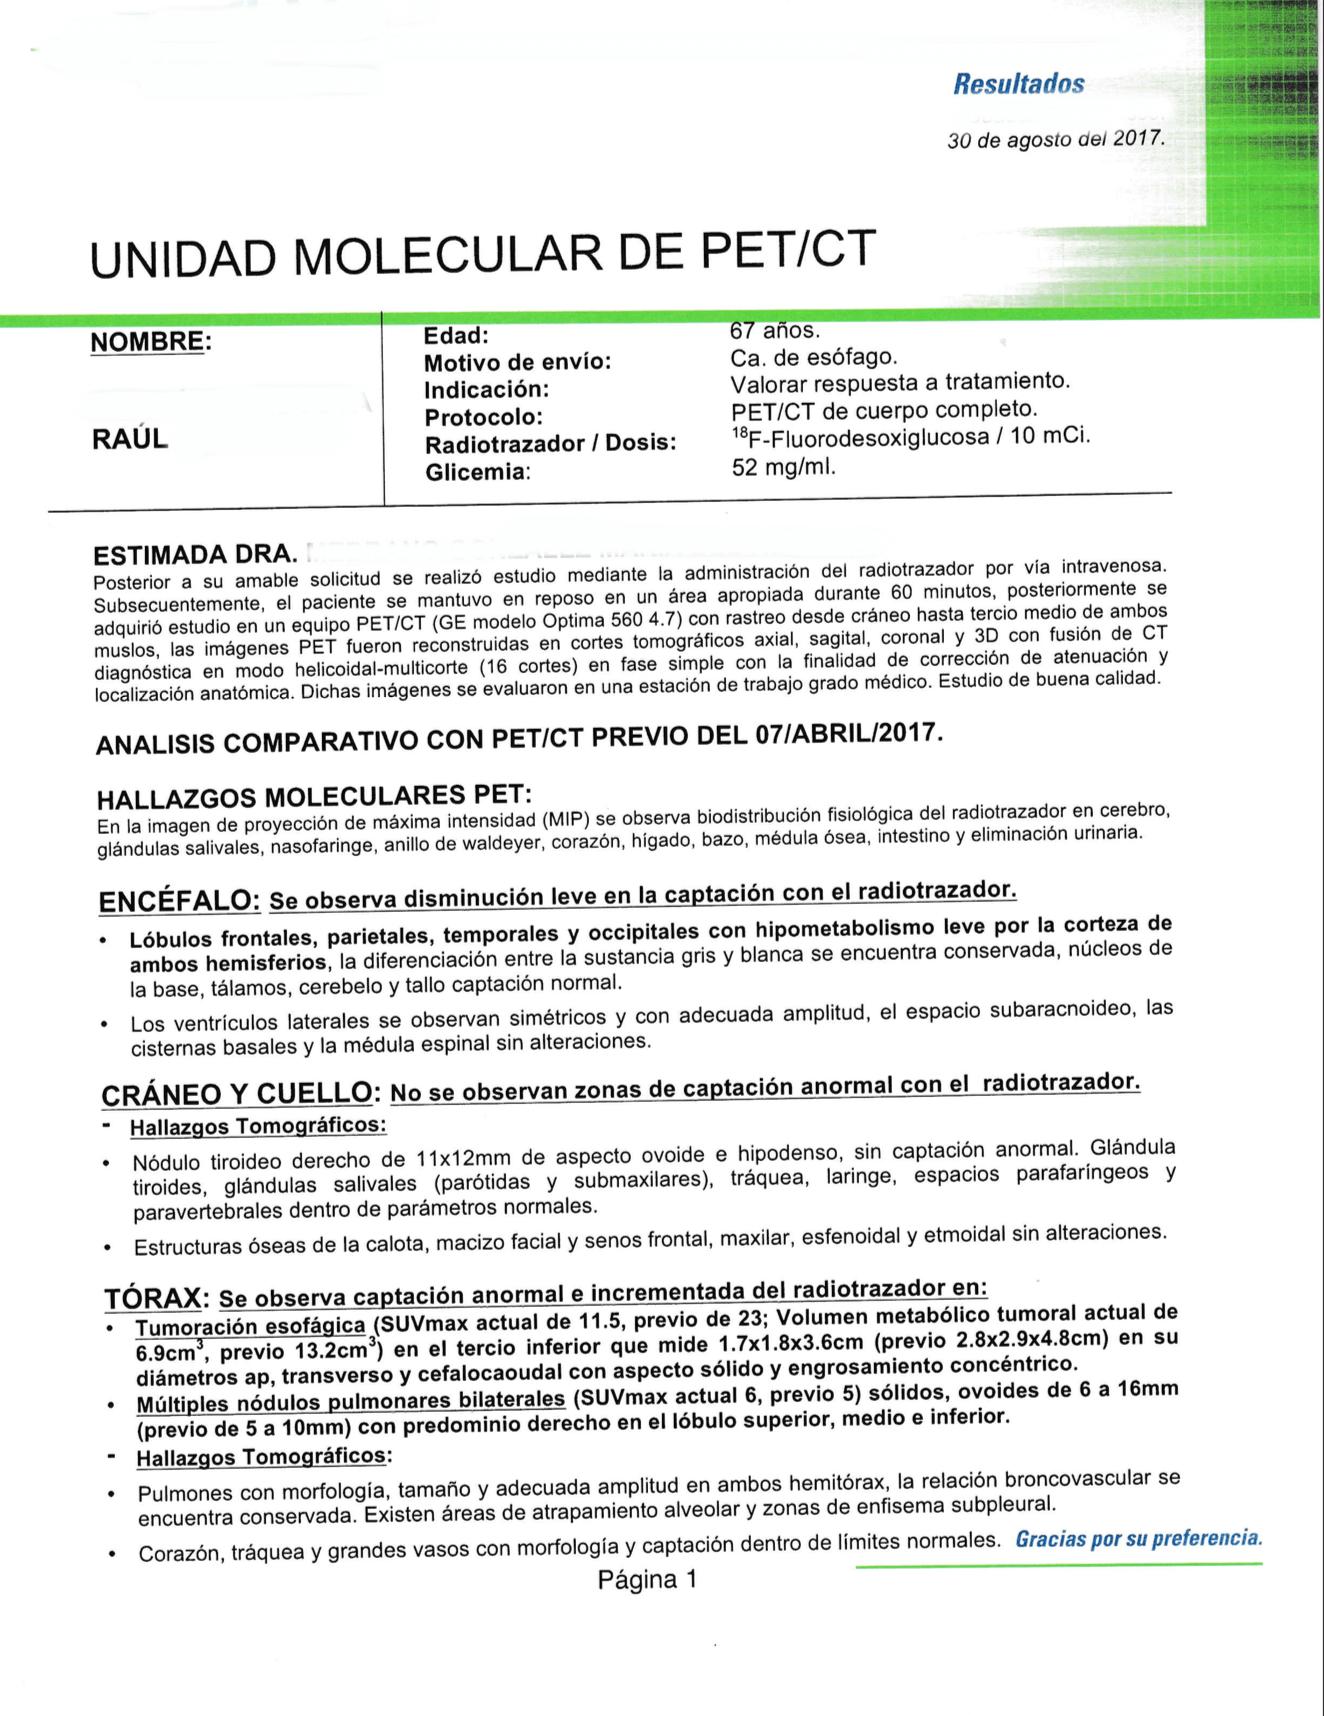 LifEscozul® - Raúl 5 - Cáncer Gástrico Intestinal